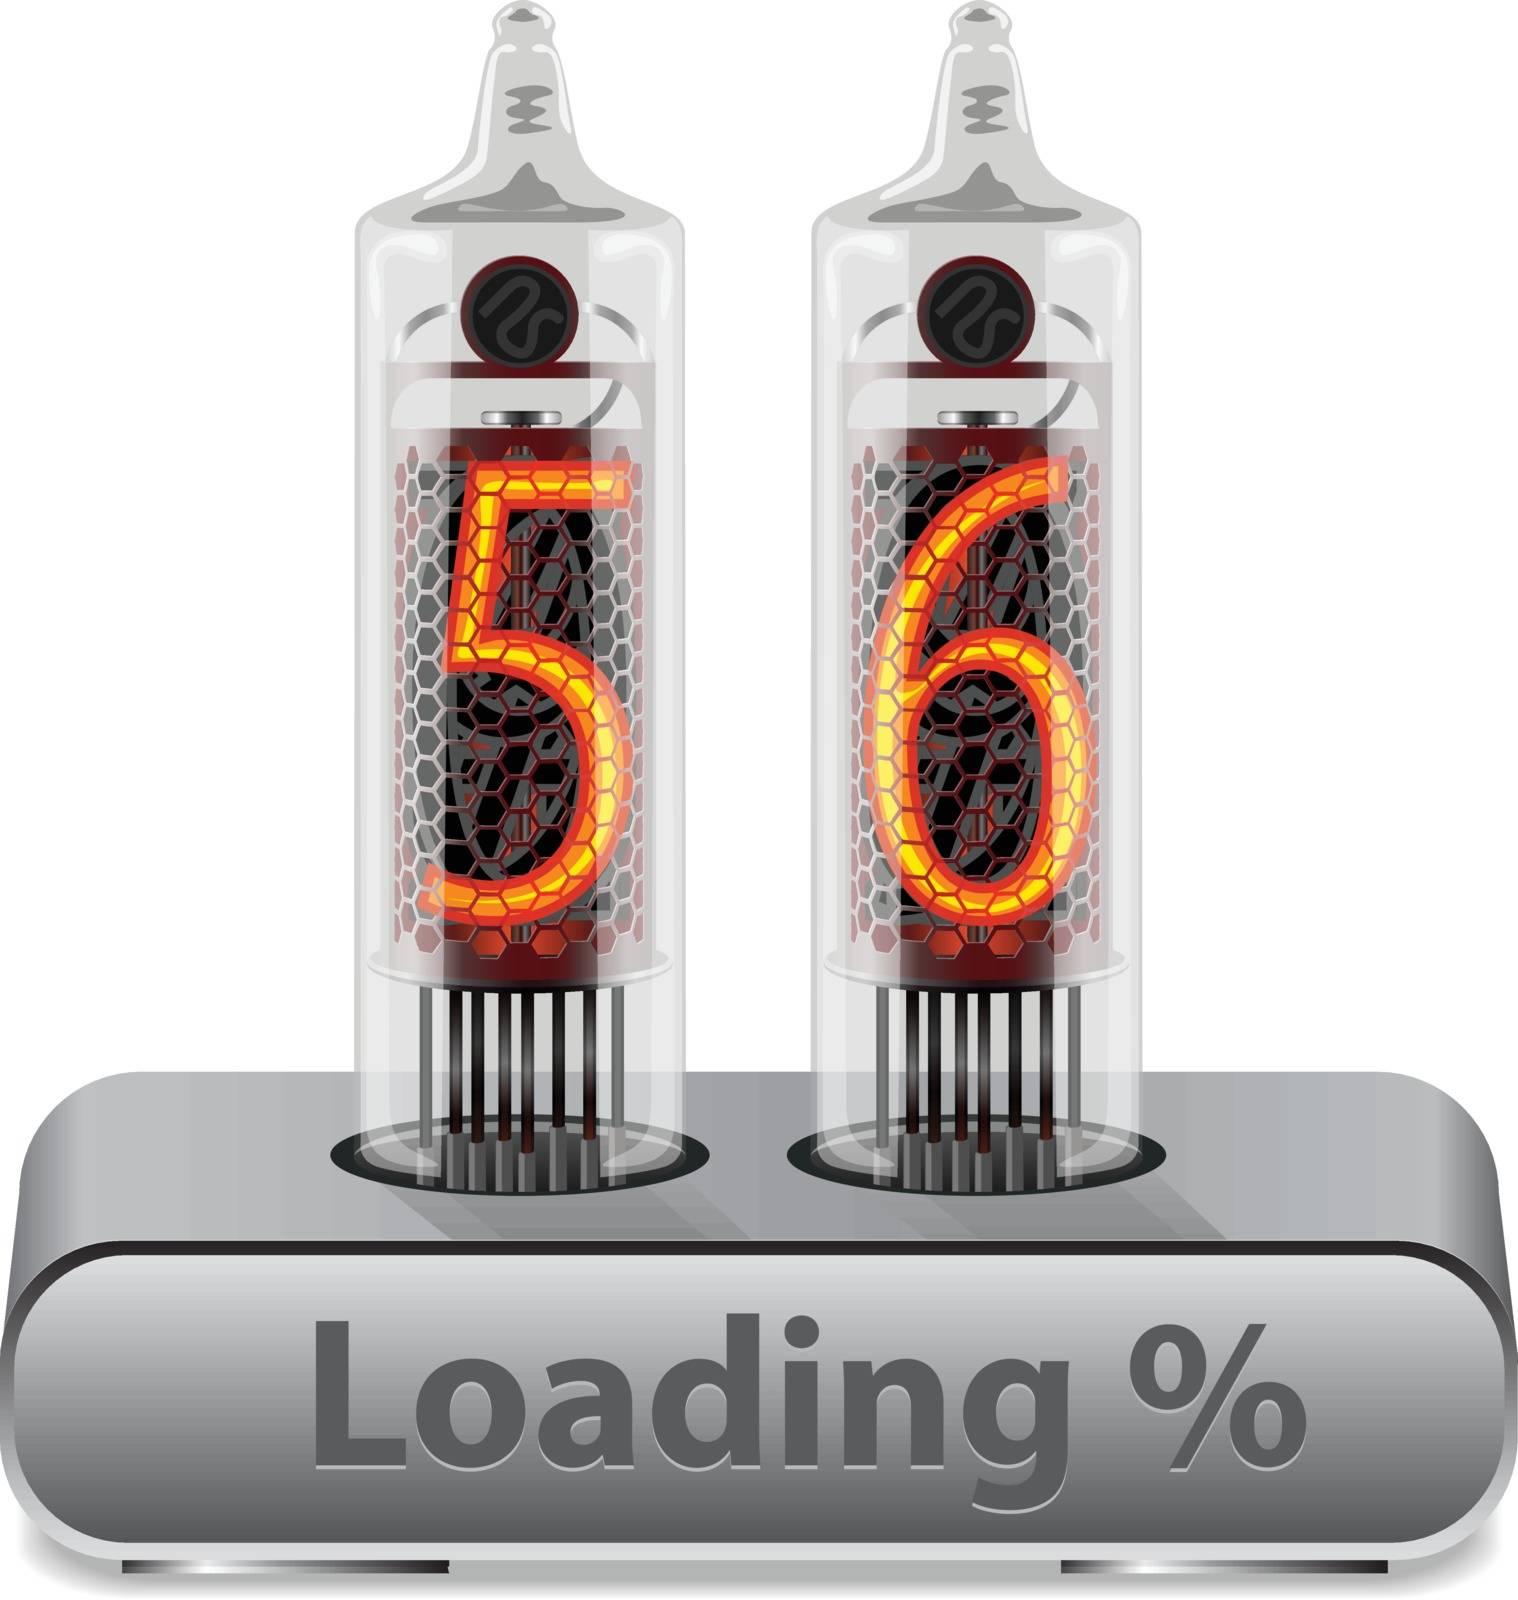 Loading Progress Indicator Interface on Vintage Vacuum Tube Display Concept